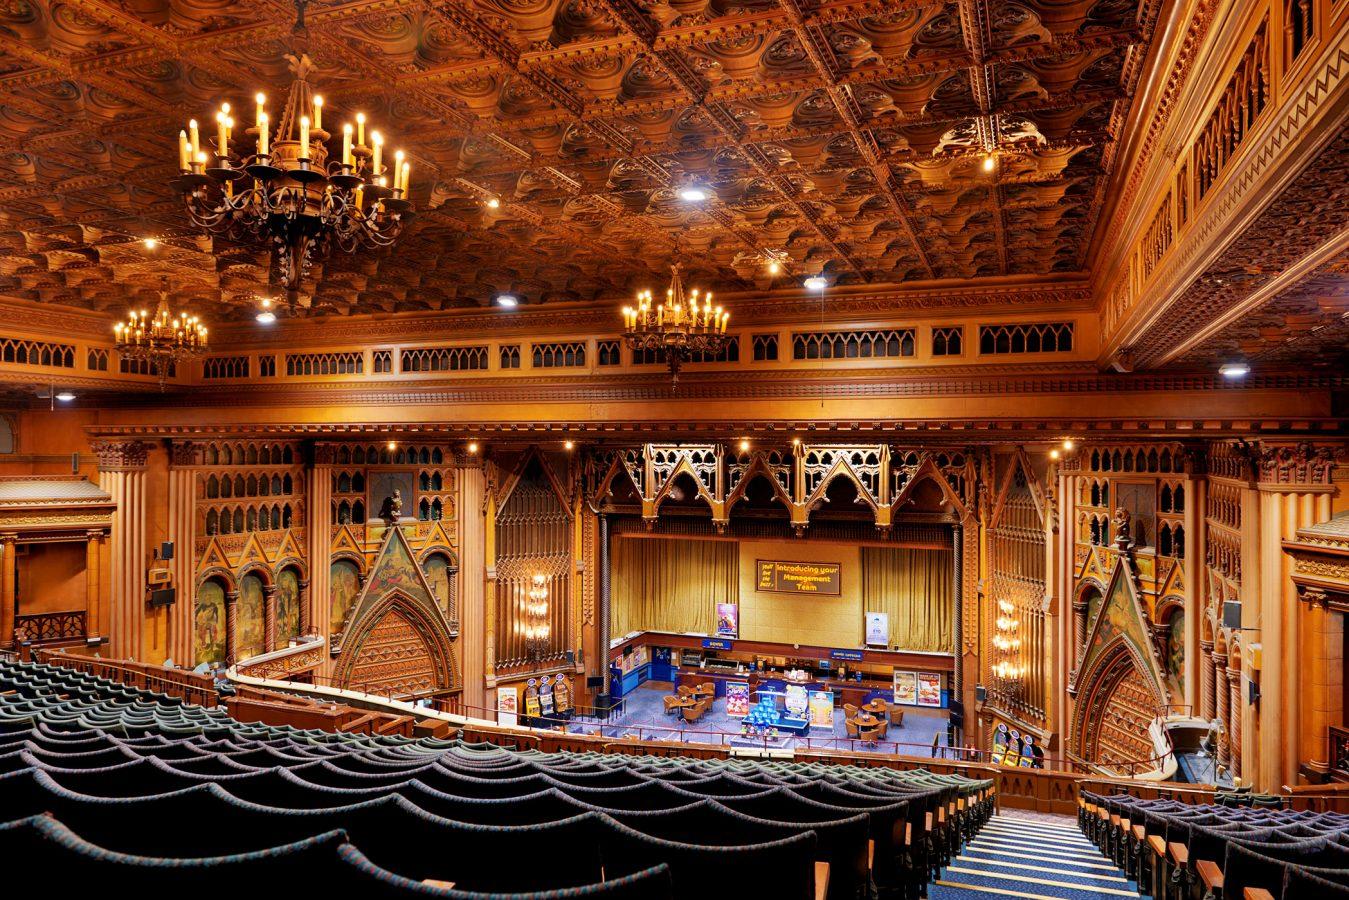 Gala Bingo Hall Tooting